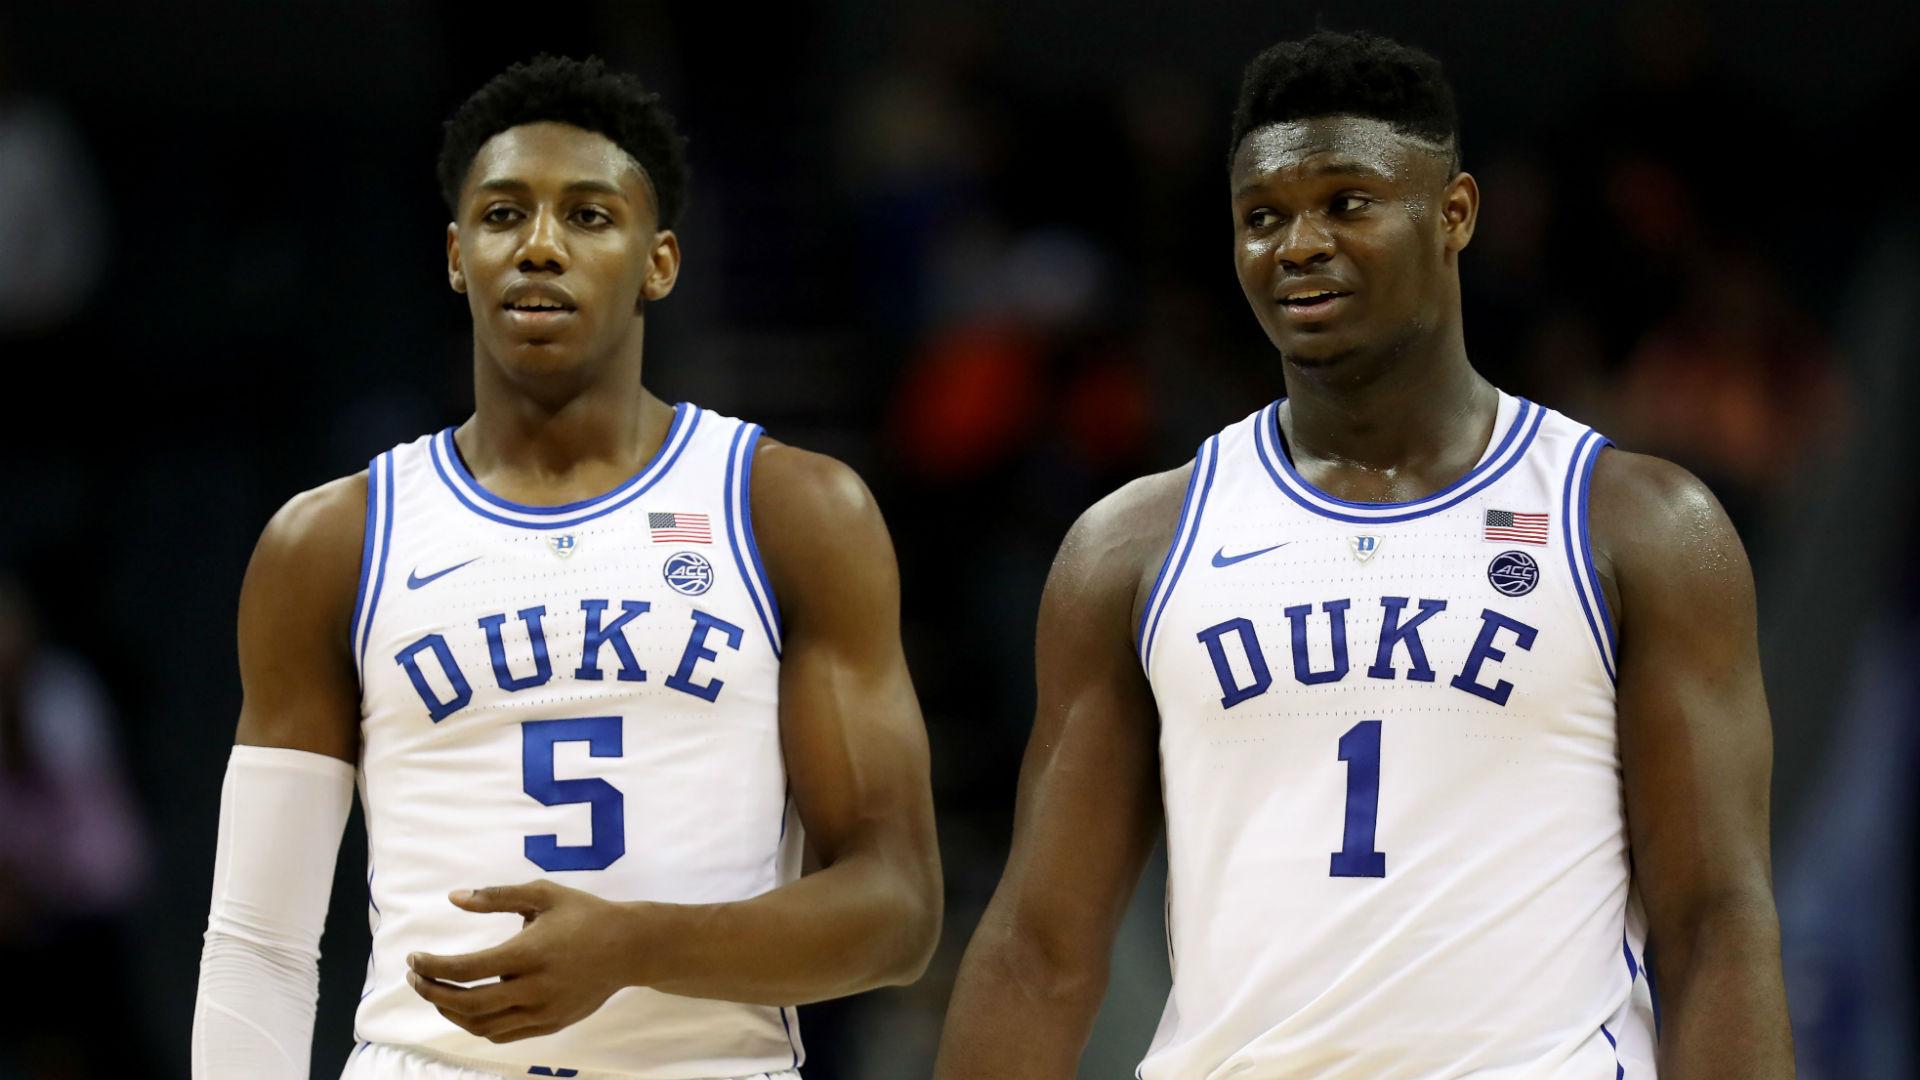 Nba Basketball New York Knicks: NBA Mock Draft 2019: Zion Williamson Is No-brainer For